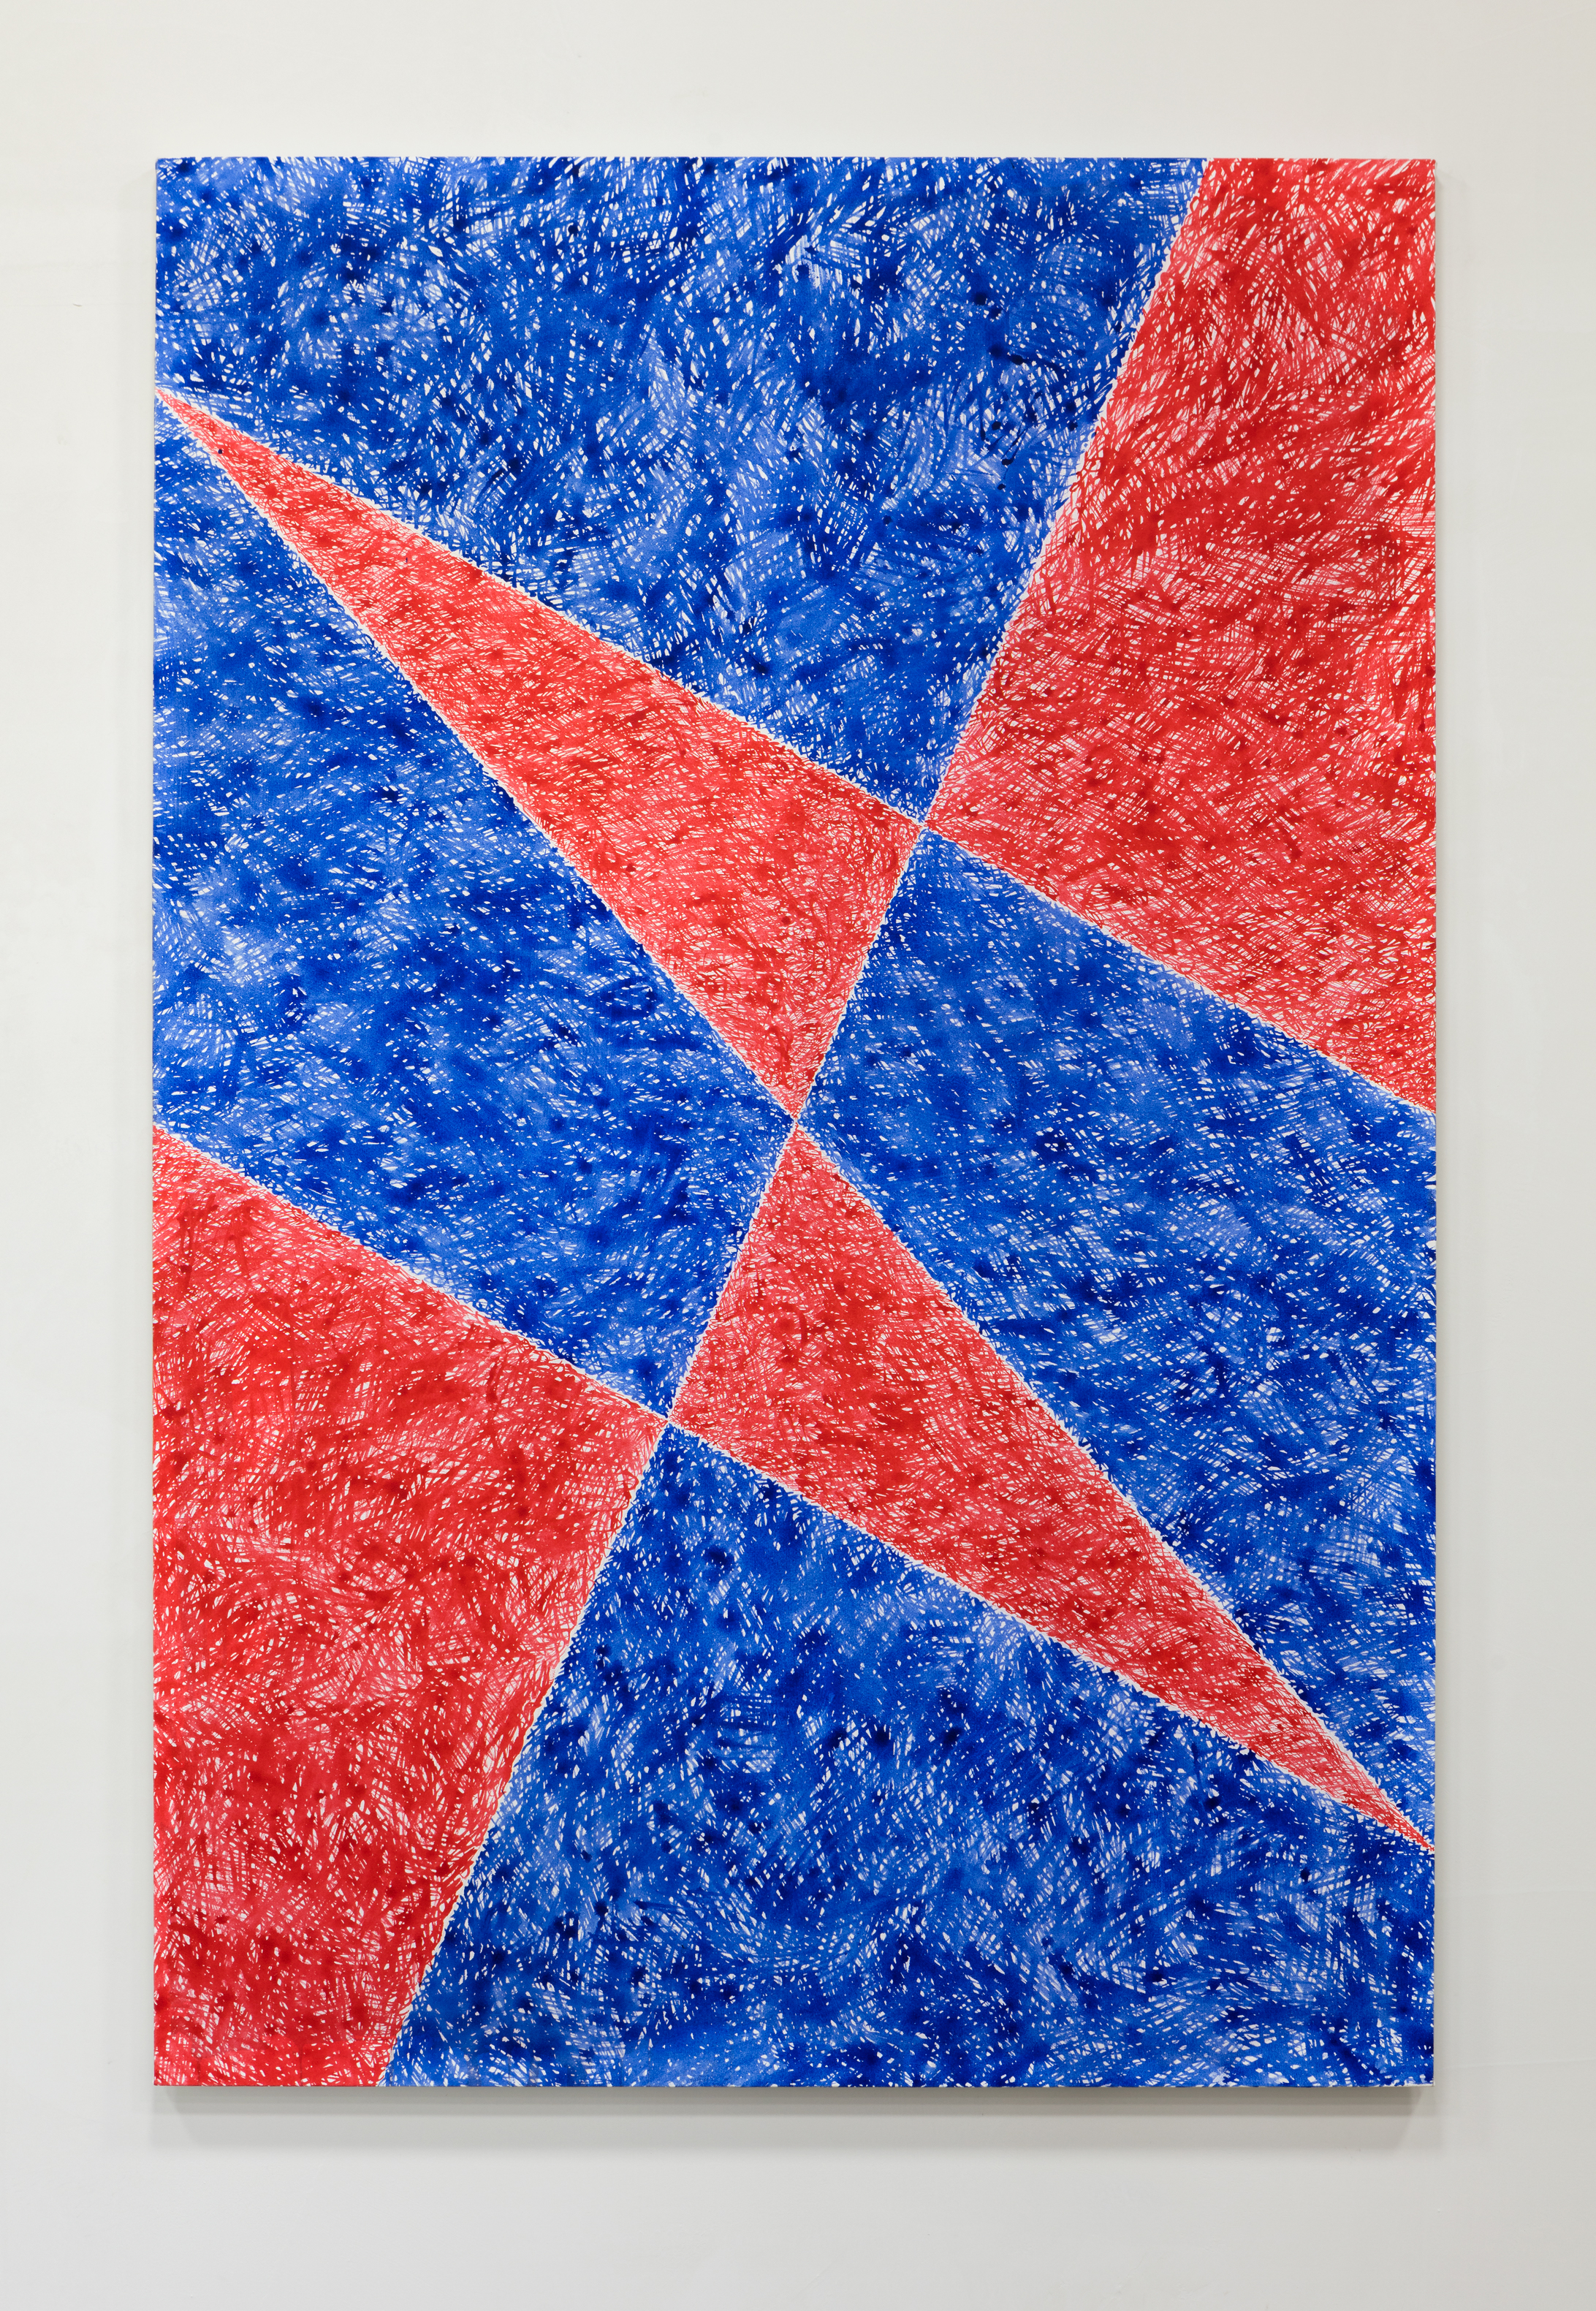 Arózqueta , 2016 acrylic ink on canvas 76.5 x 53.25 inches